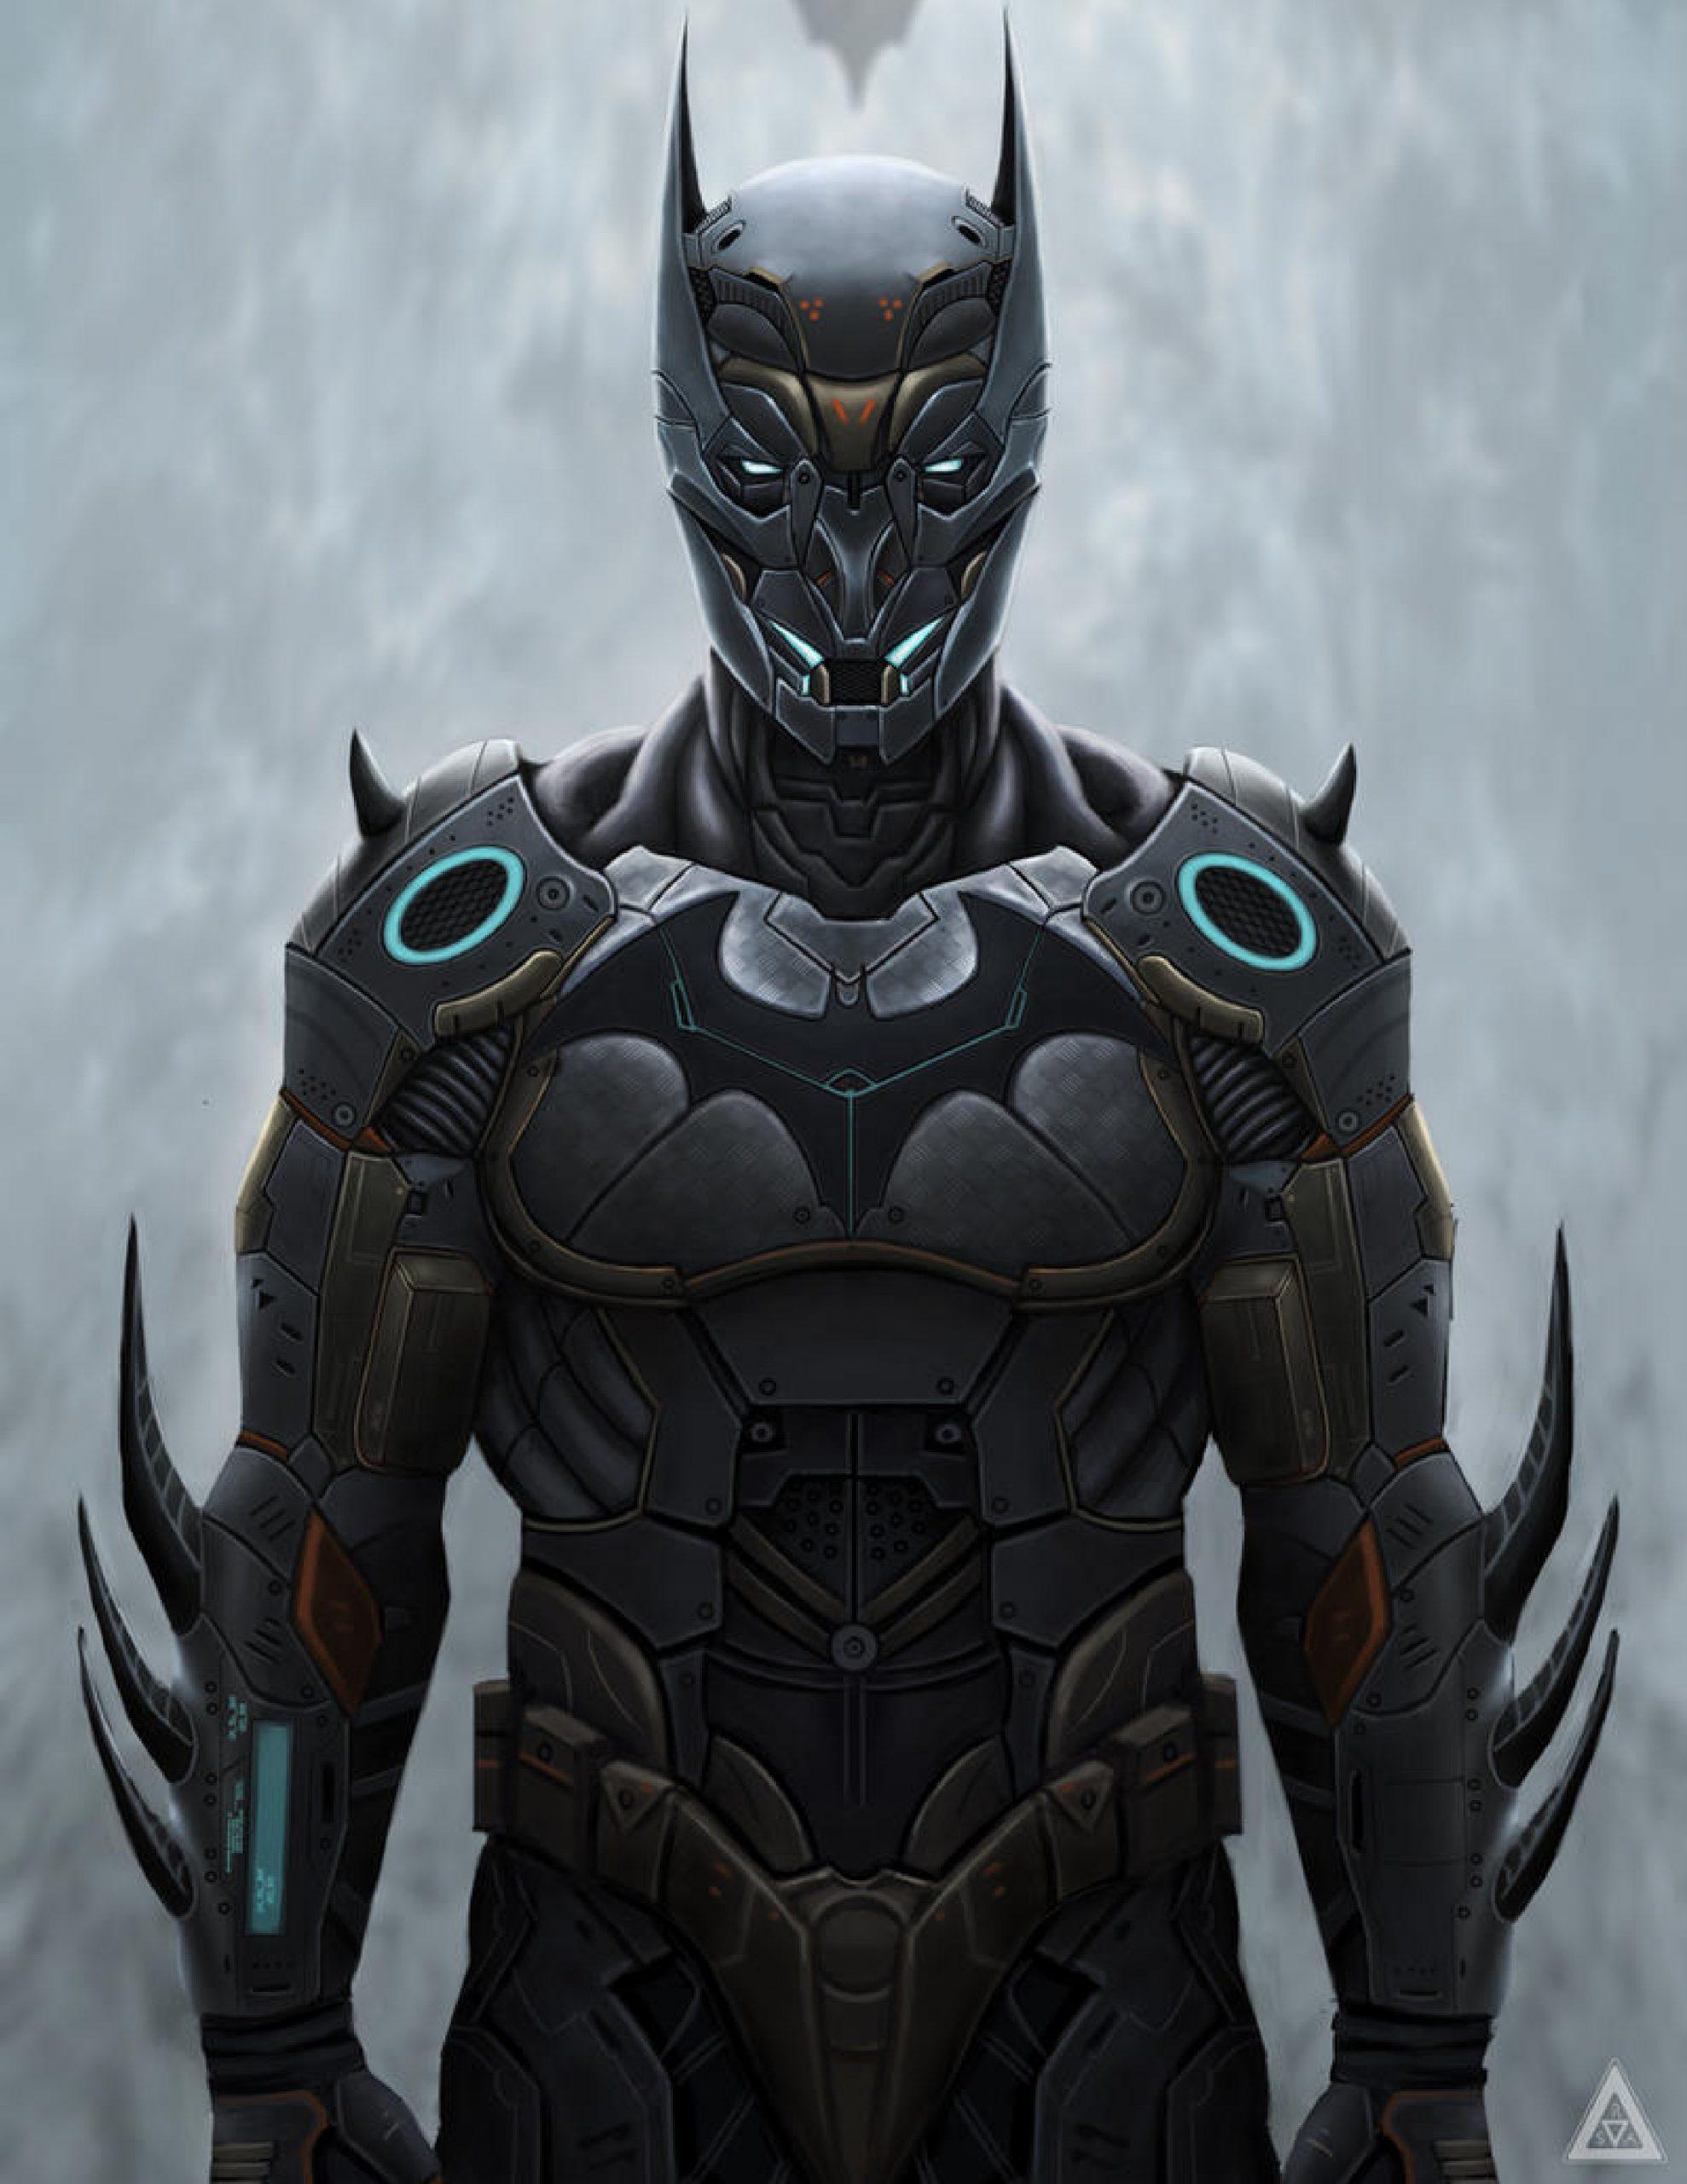 Cyborg Batman